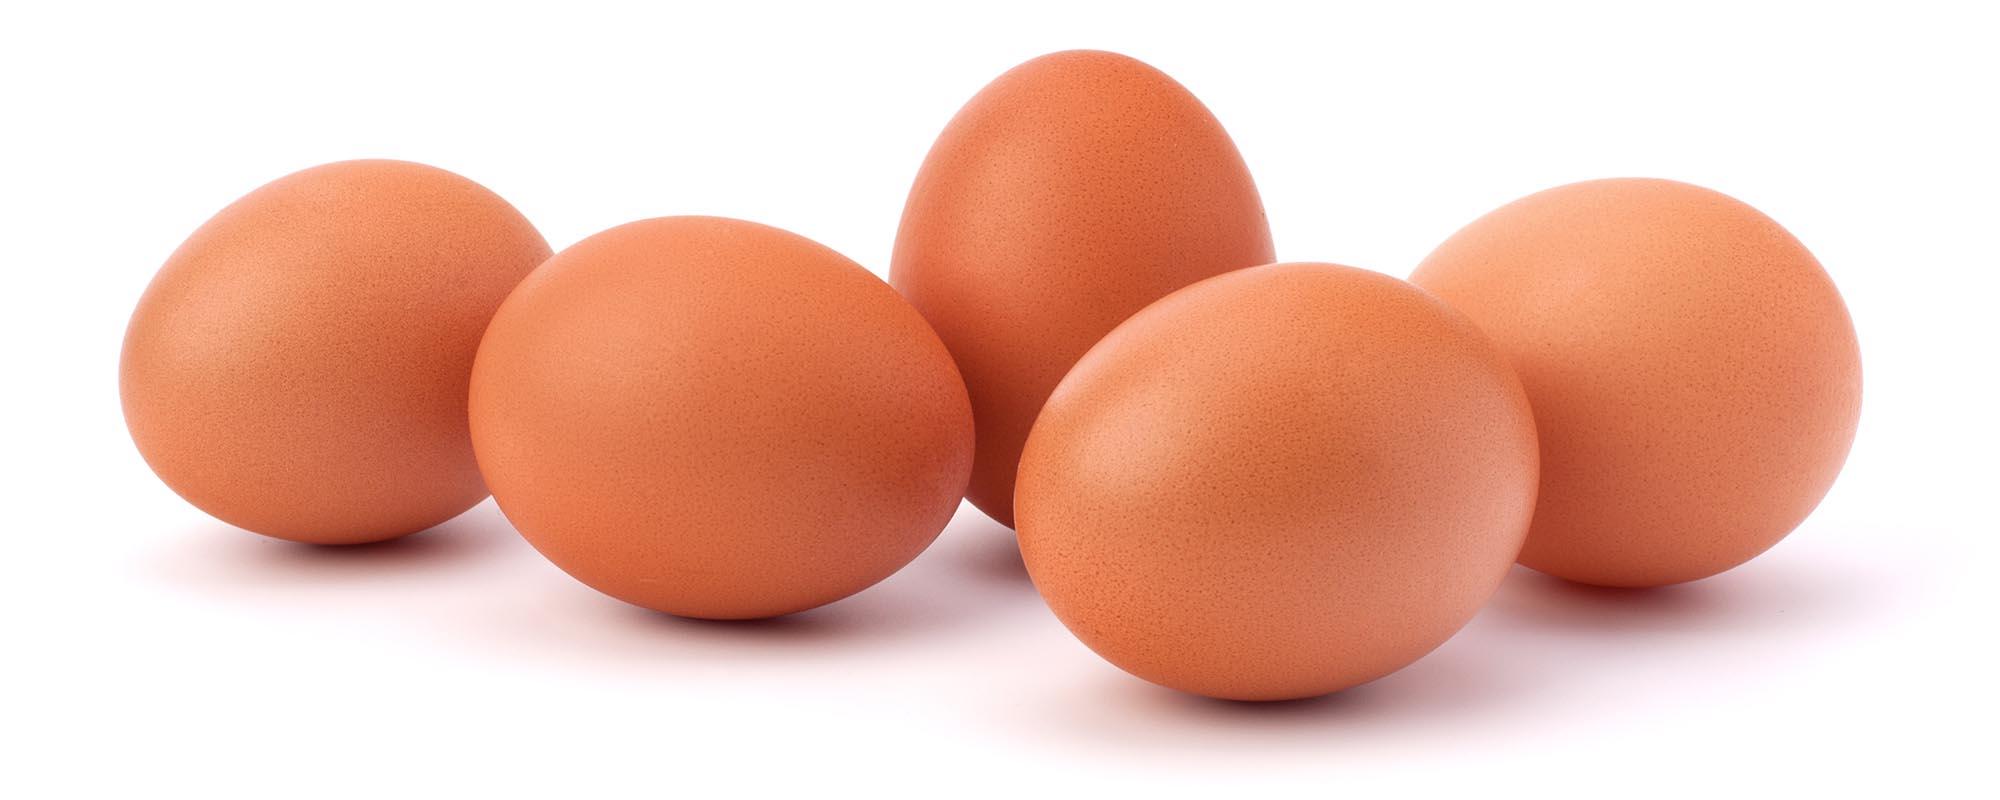 Lutsch Mir Die Eier